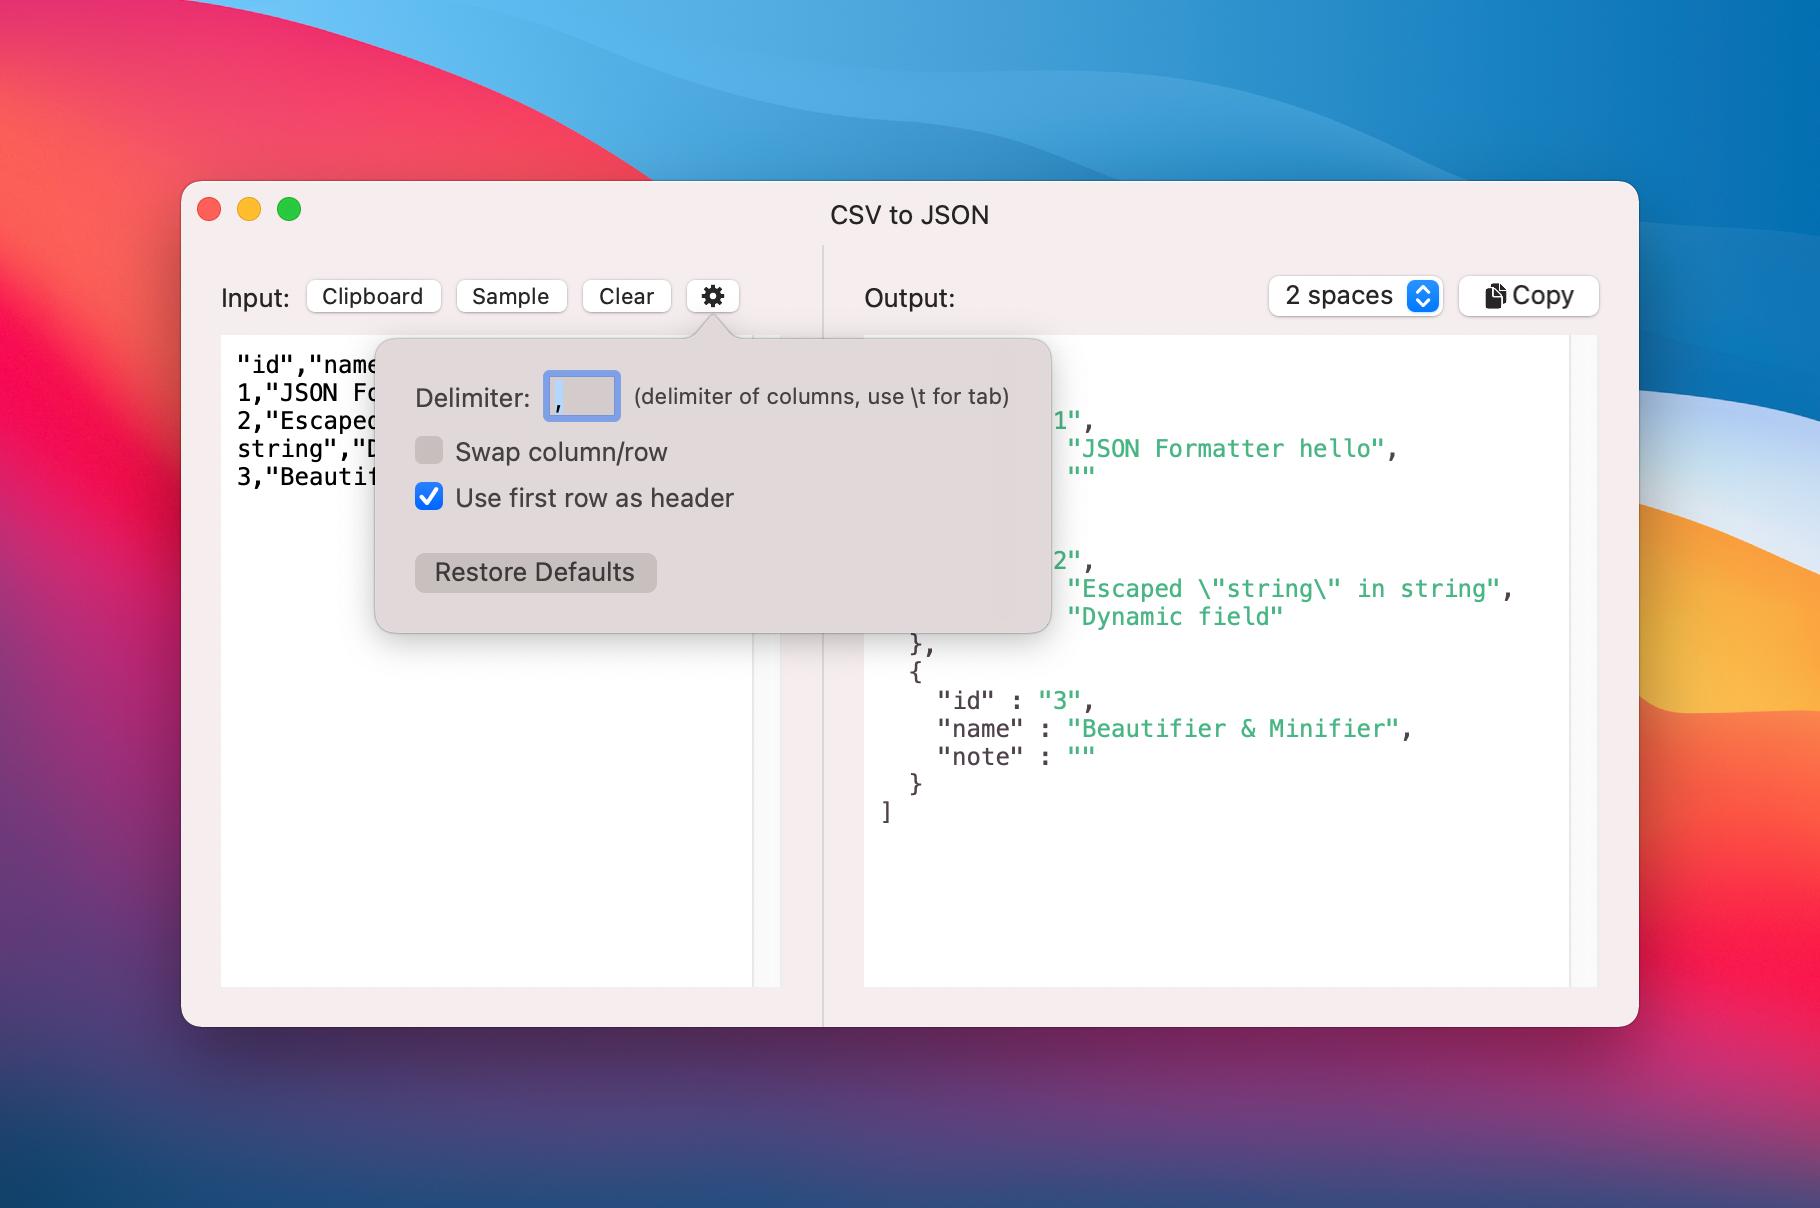 CSV to JSON convert options